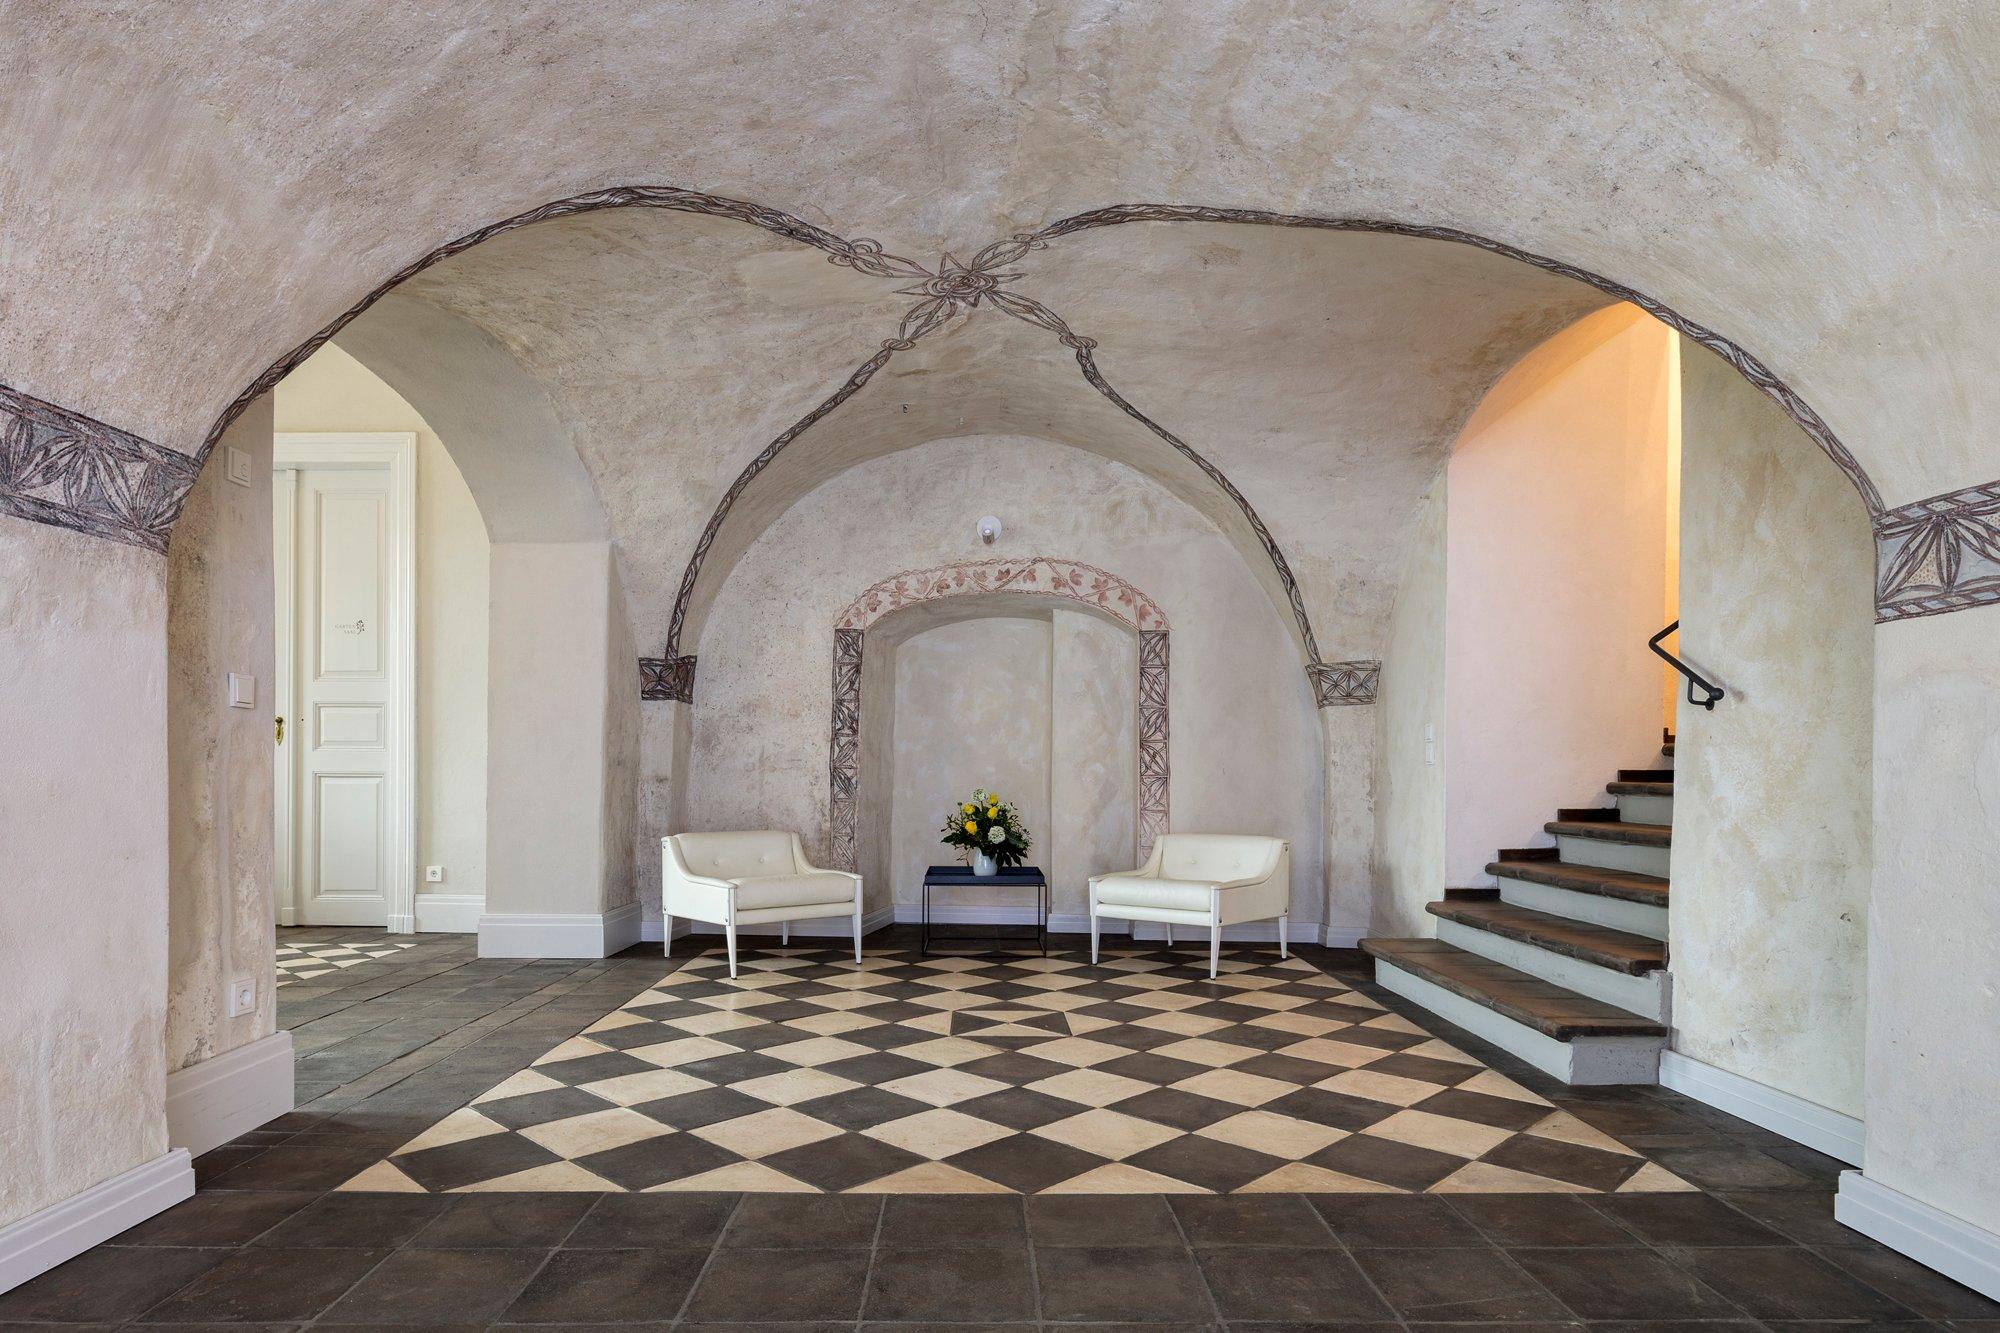 Eingangsbereich.Foto: Till Schuster